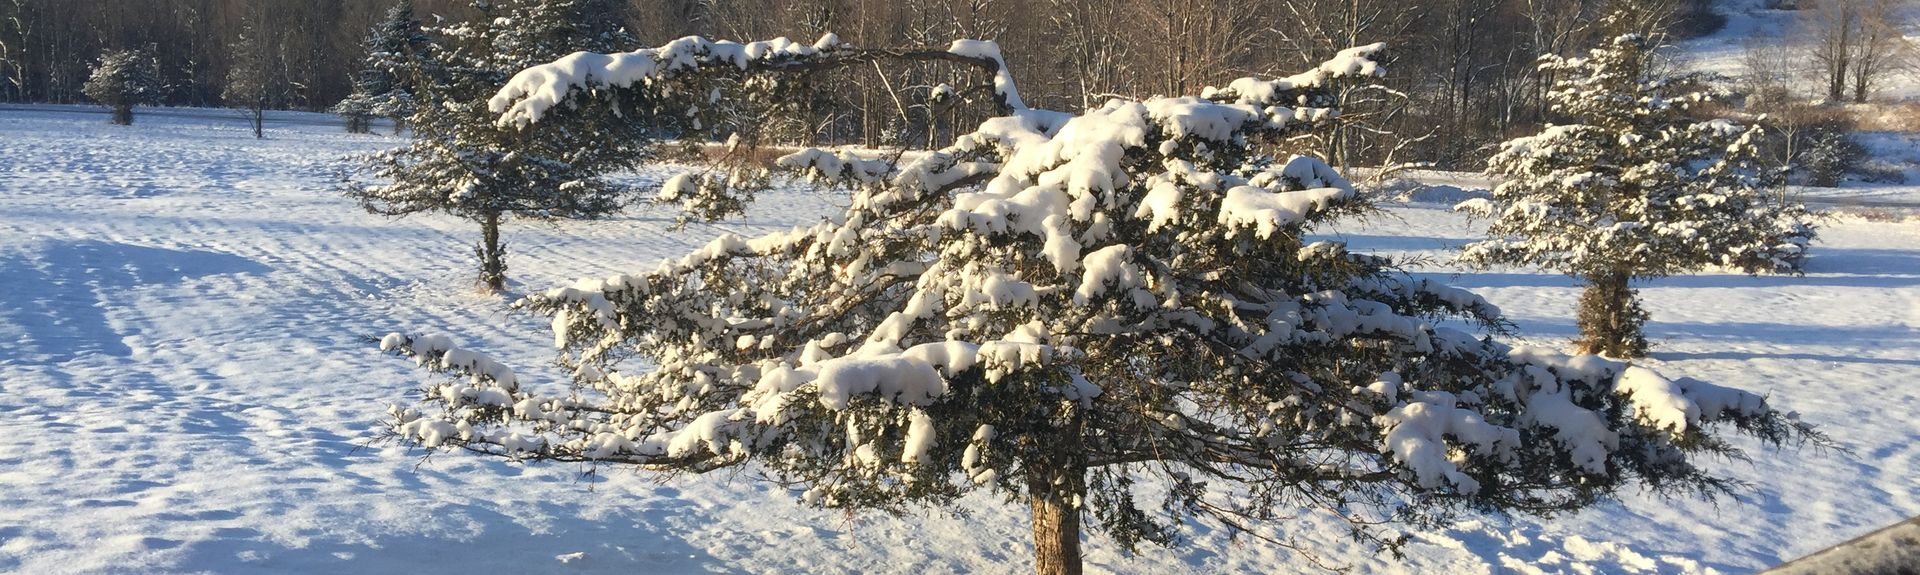 Mountain Top Arboretum, Tannersville, NY, USA